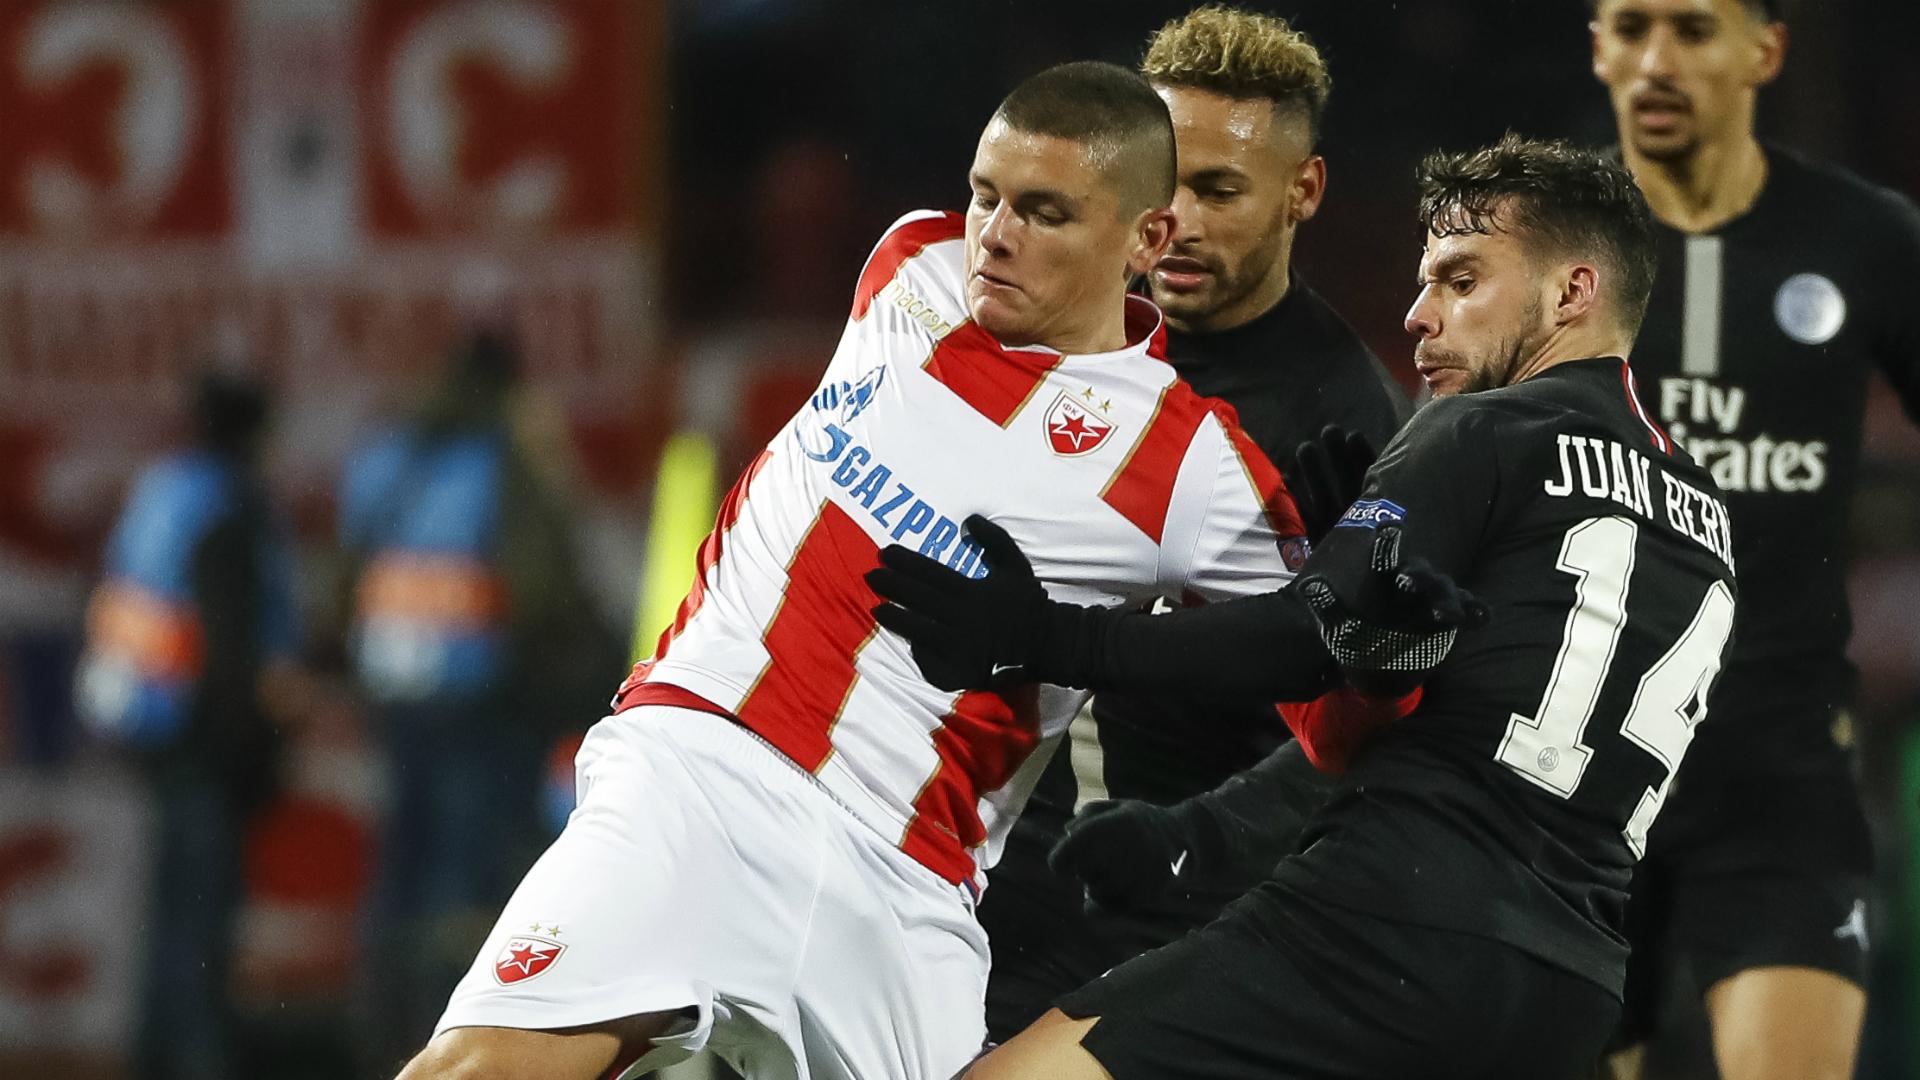 The next Luka Jovic? Eintracht Frankfurt sign Dejan Joveljic